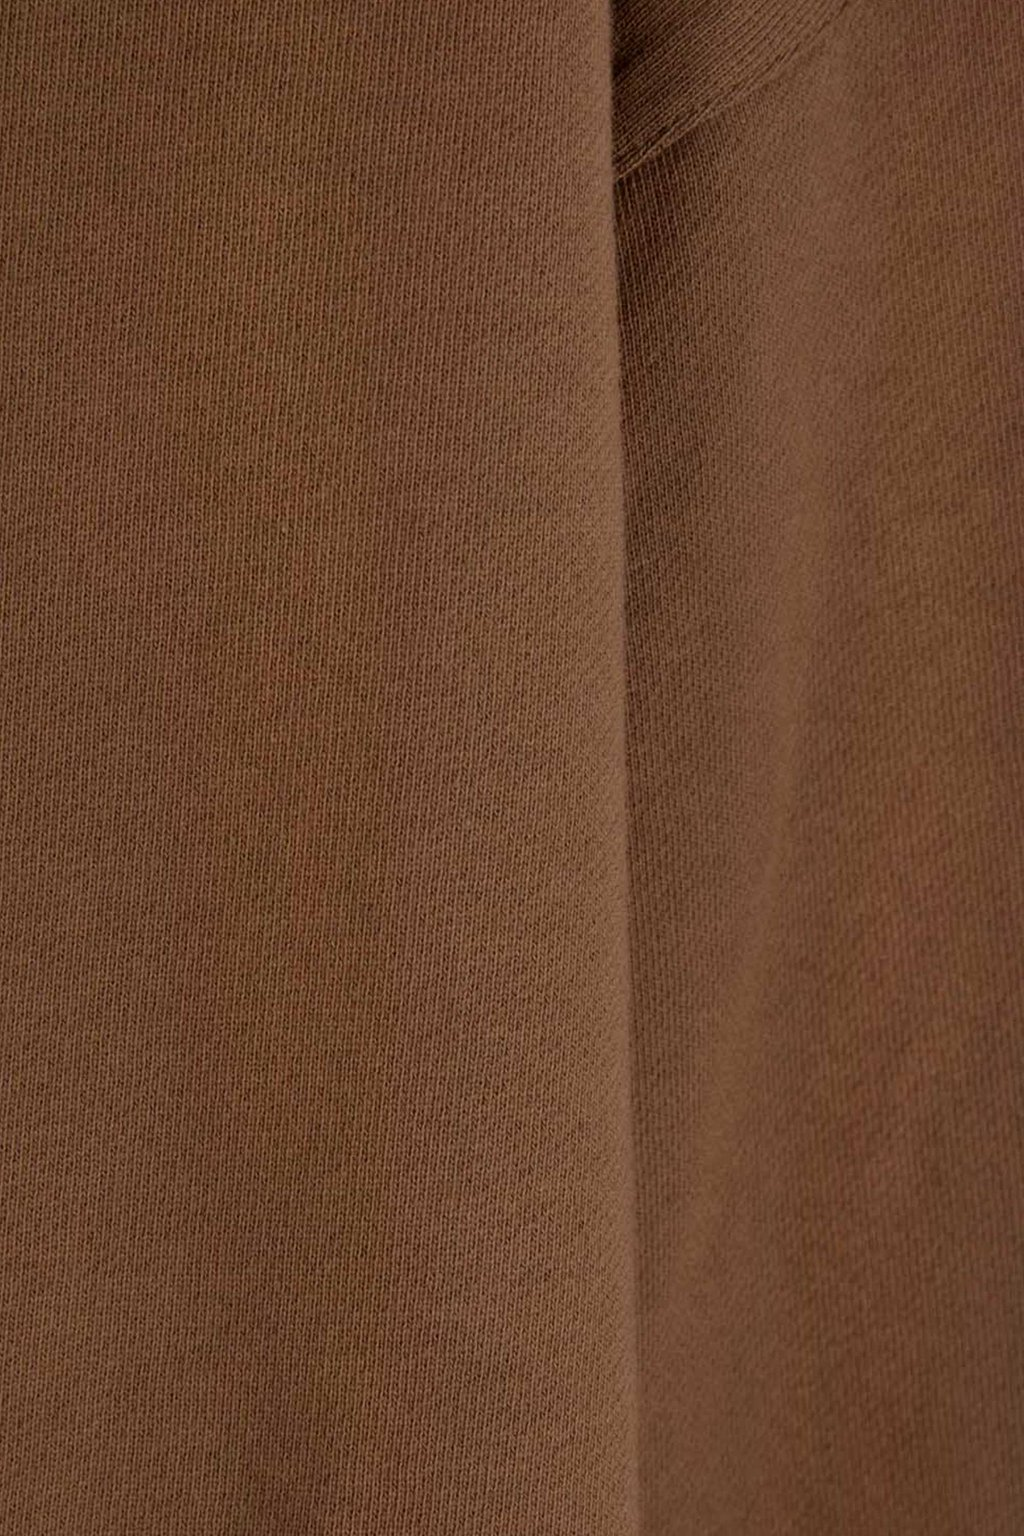 Sweatshirt 1950 Camel 8